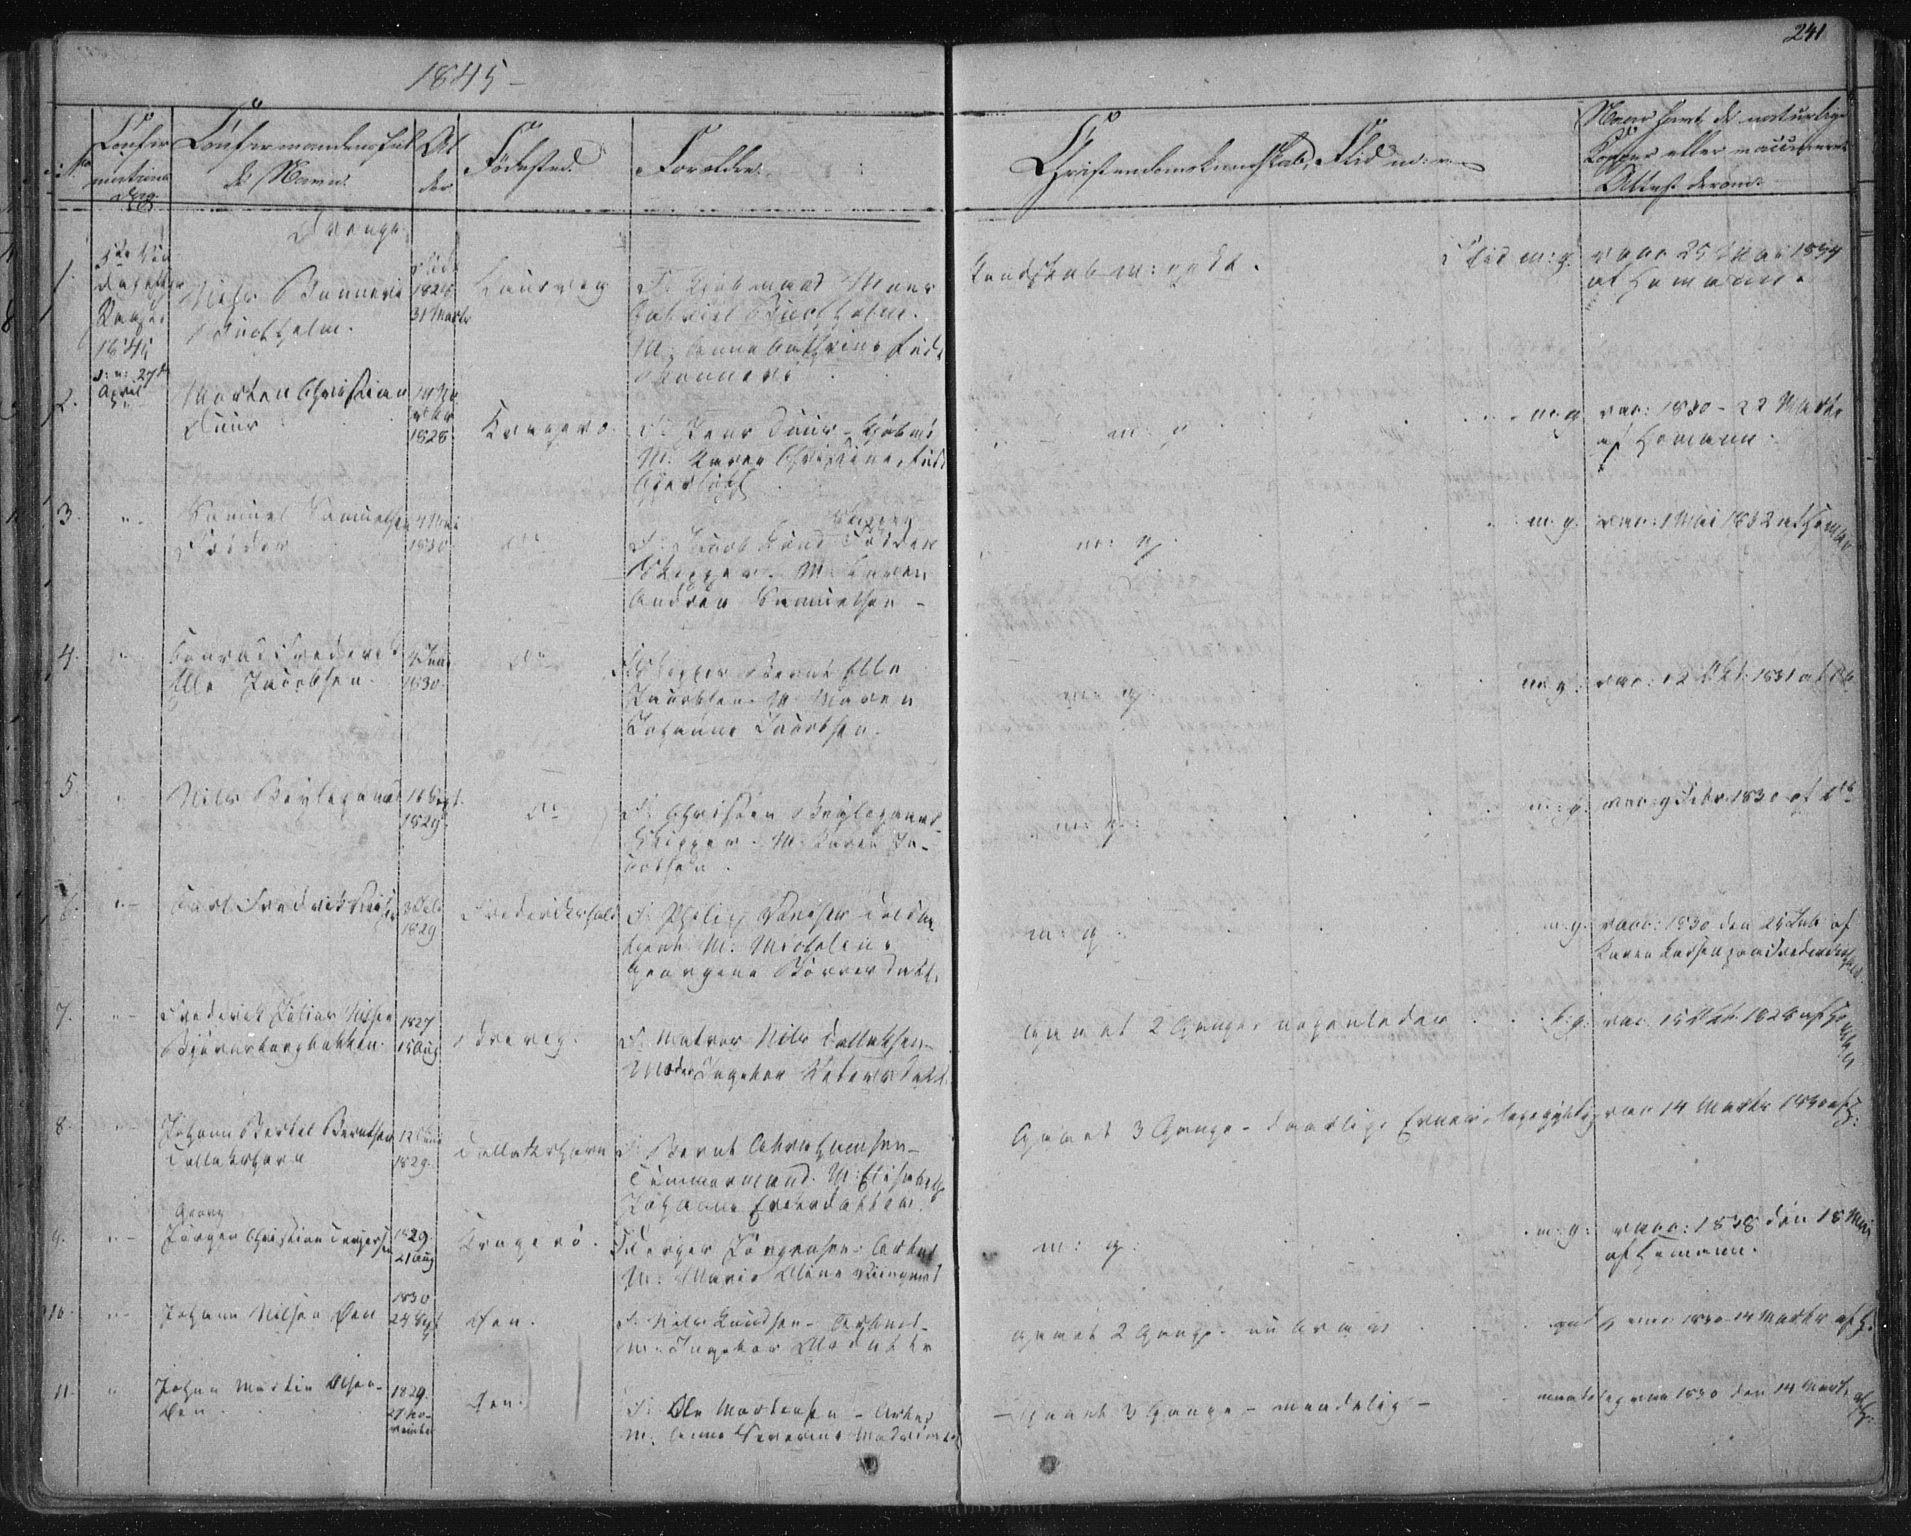 SAKO, Kragerø kirkebøker, F/Fa/L0005: Ministerialbok nr. 5, 1832-1847, s. 241